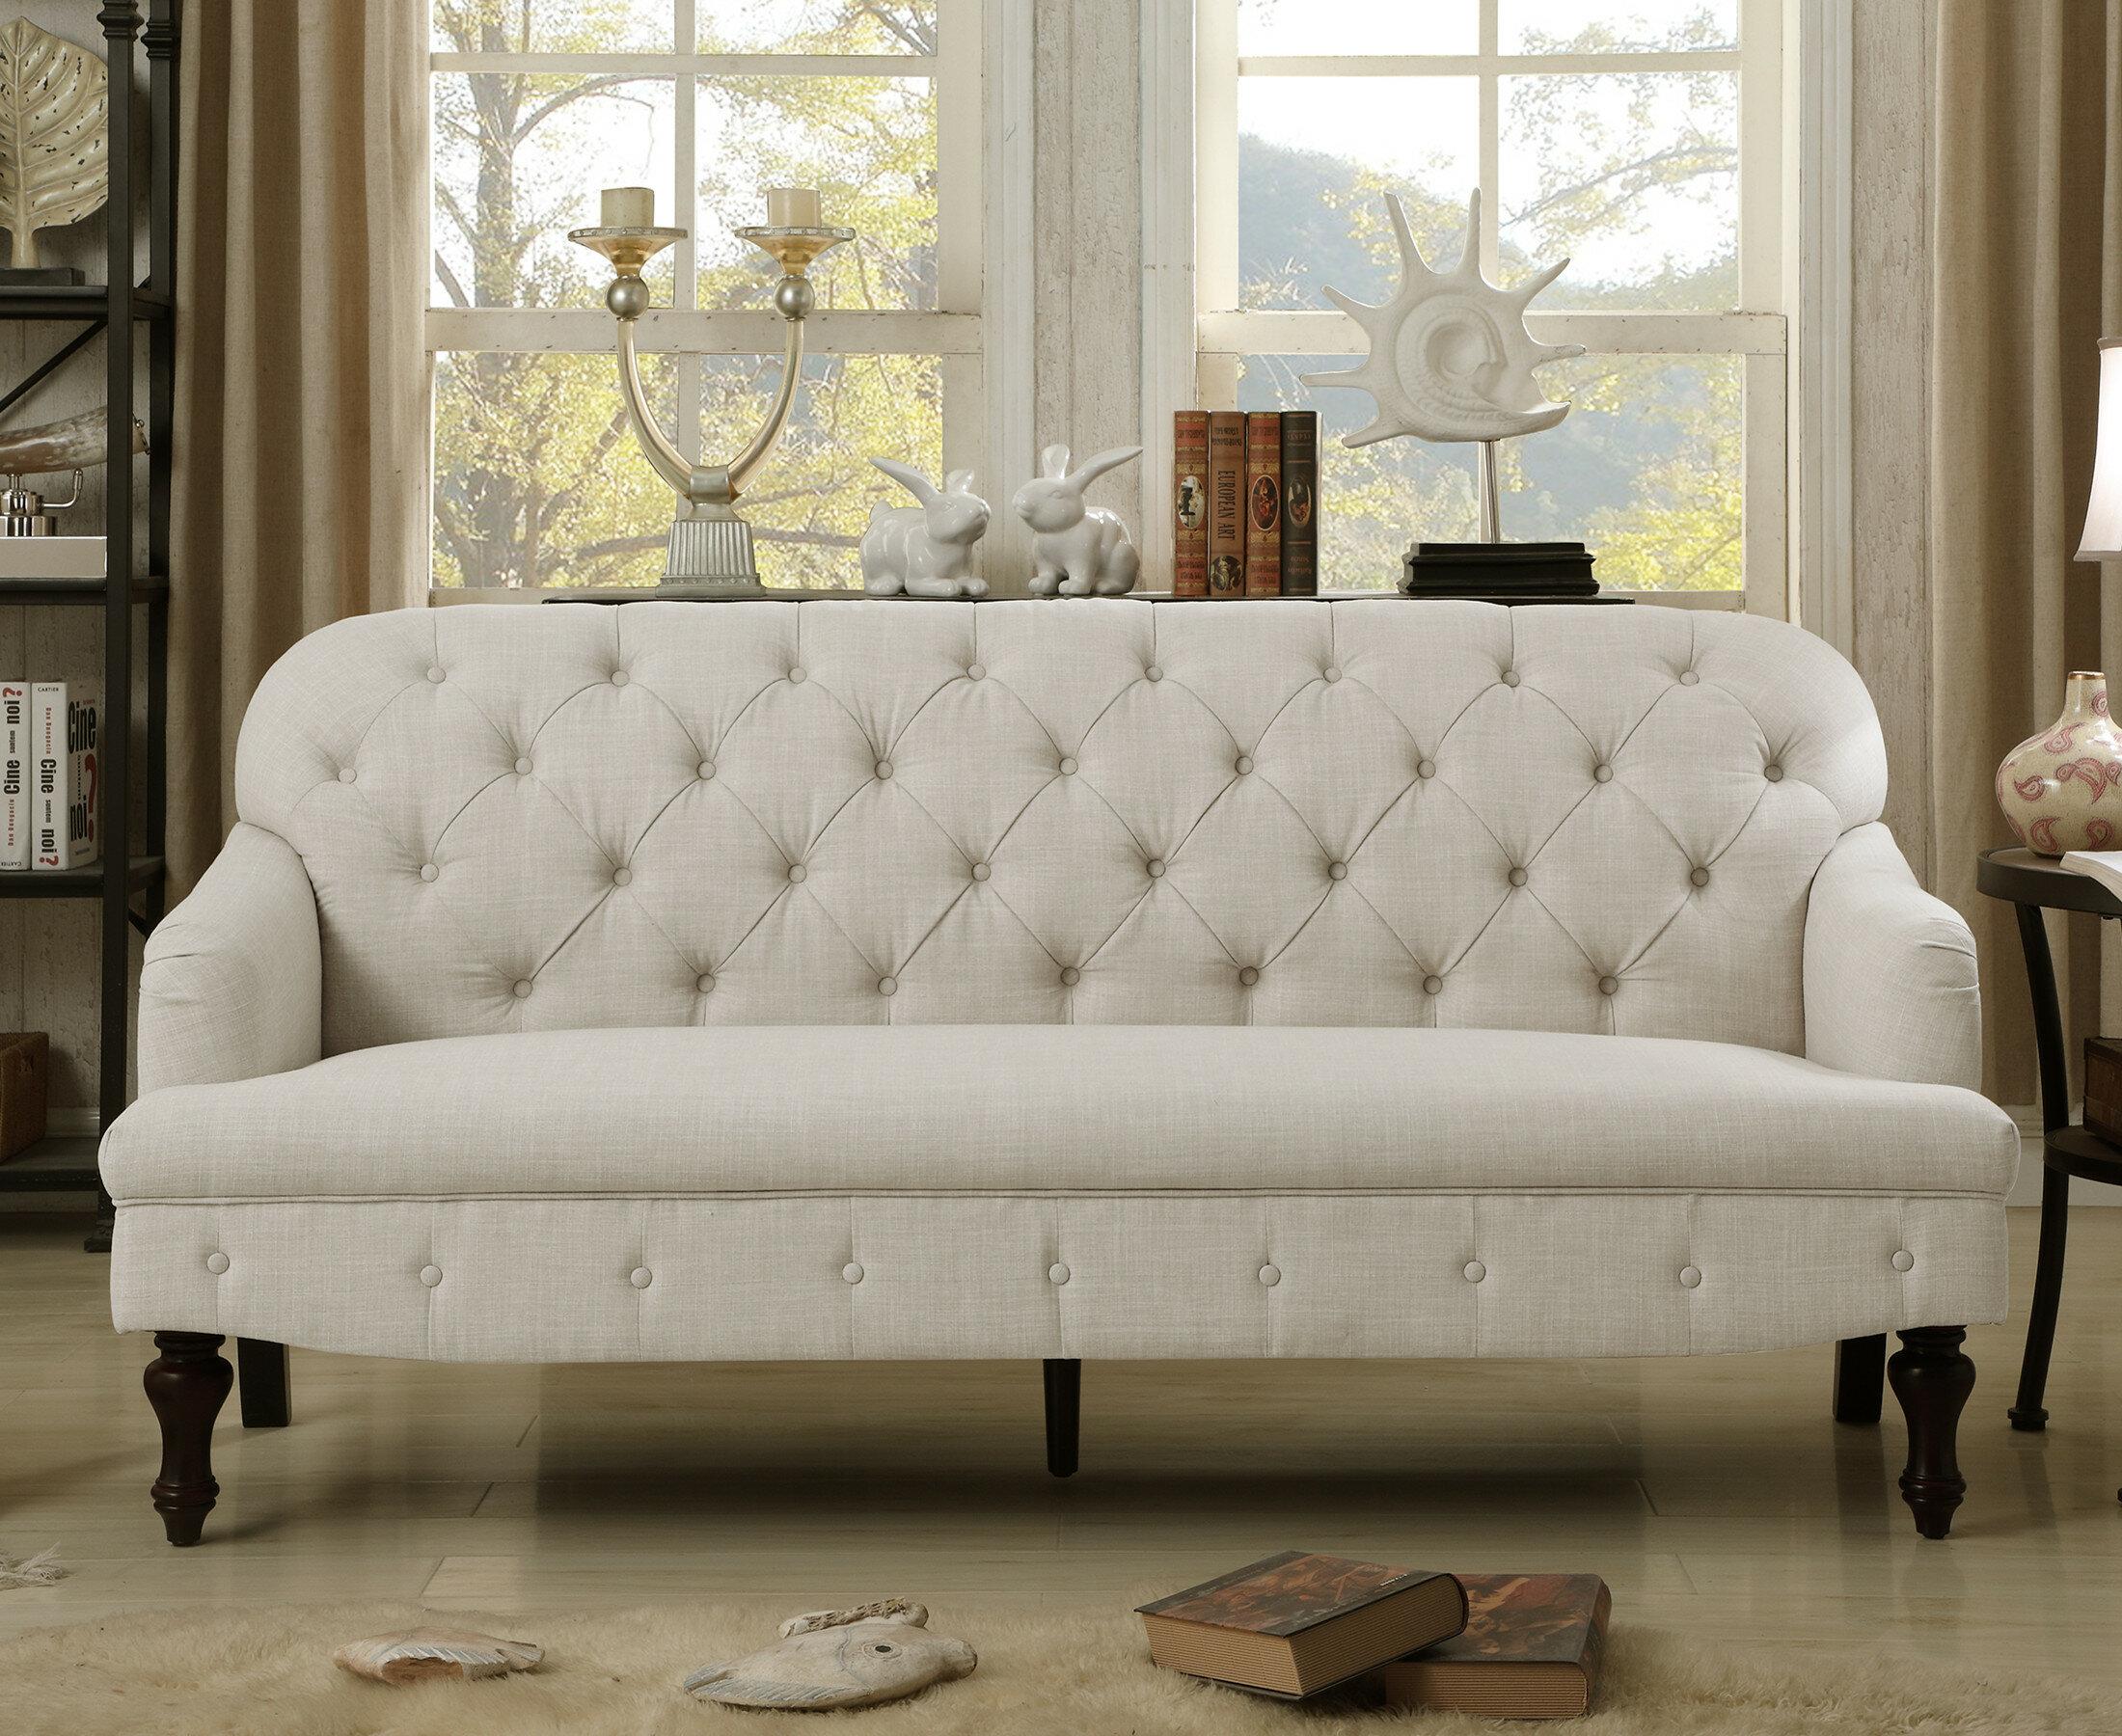 Great Darby Home Co Fonzo Tufted Sofa U0026 Reviews | Wayfair